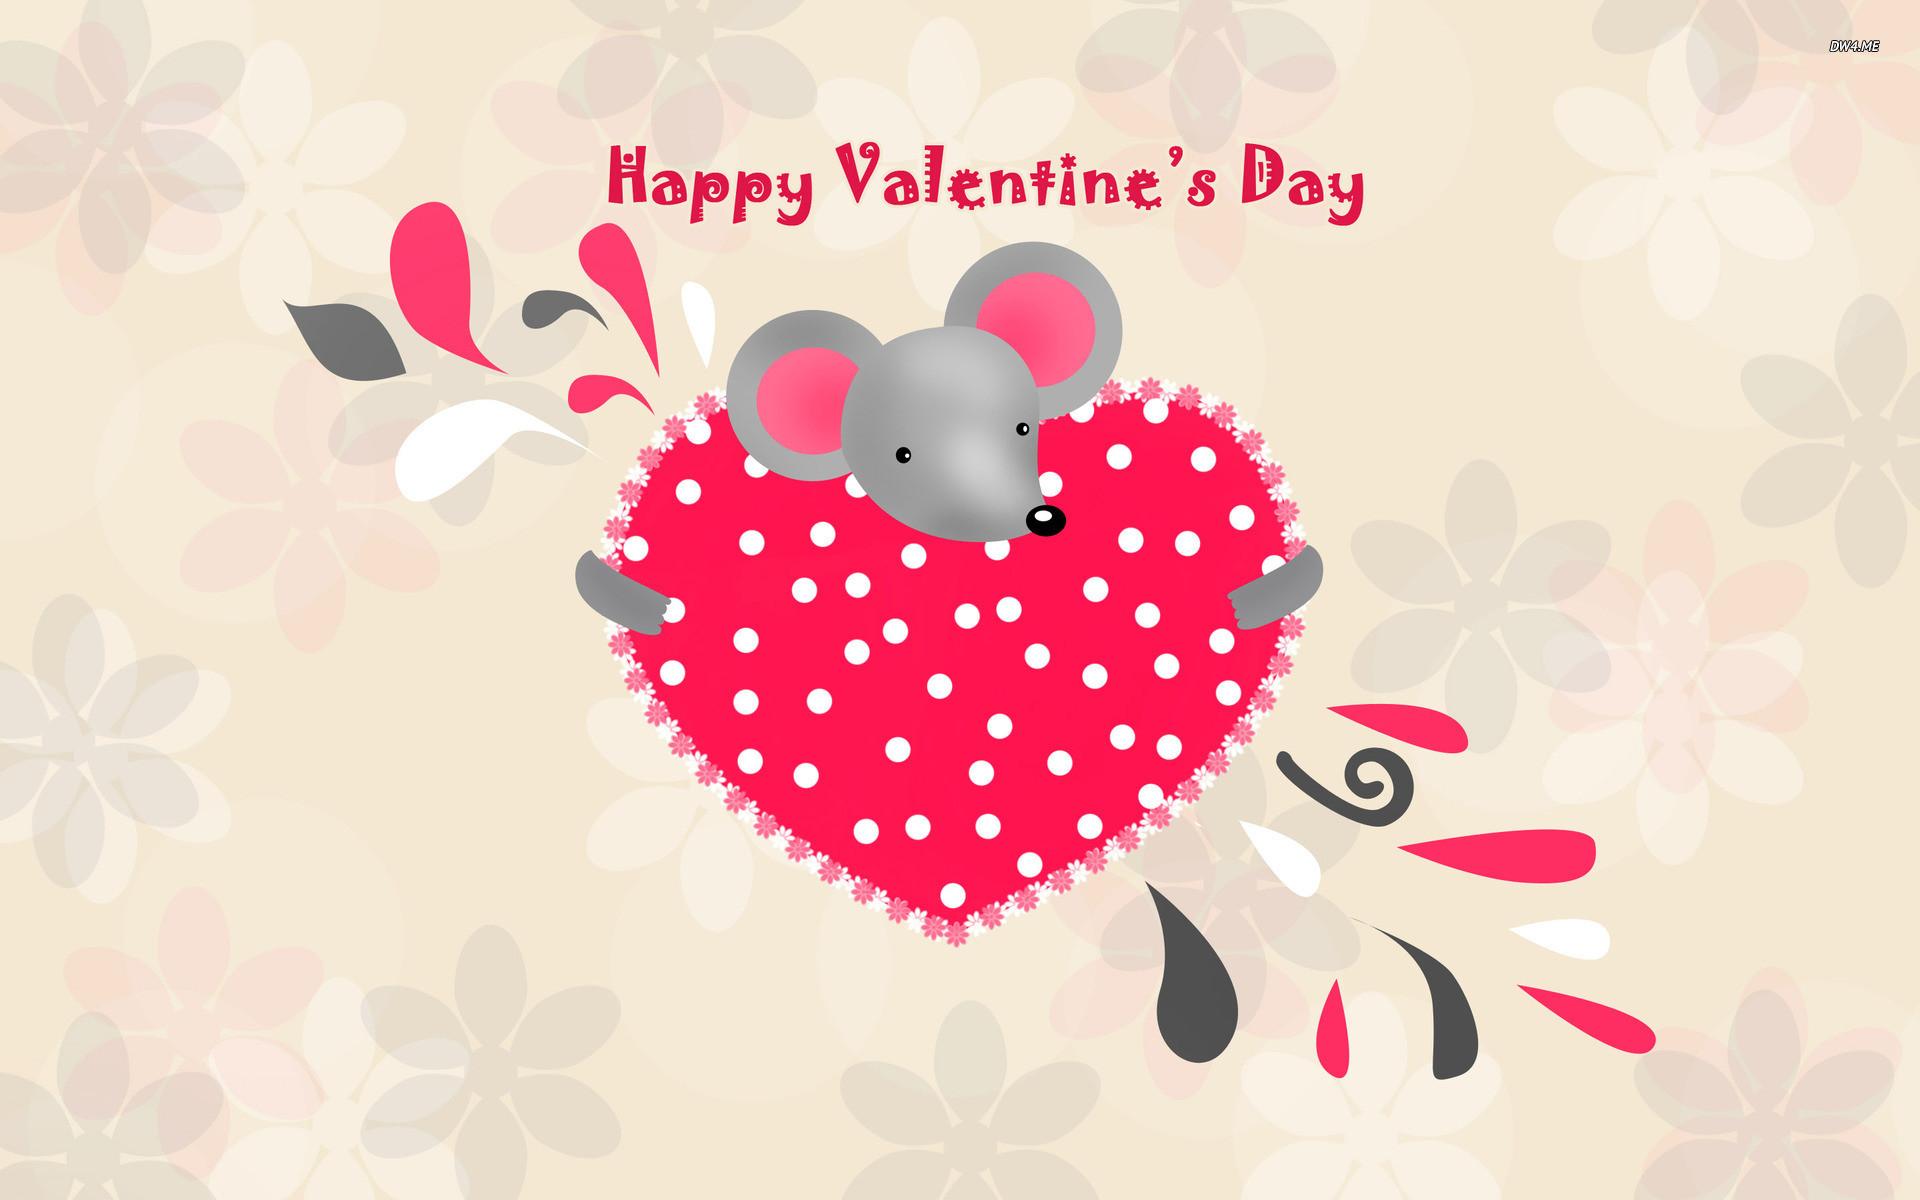 Valentine Day Love Desktop Wallpaper : Valentine Wallpapers for Desktop ??